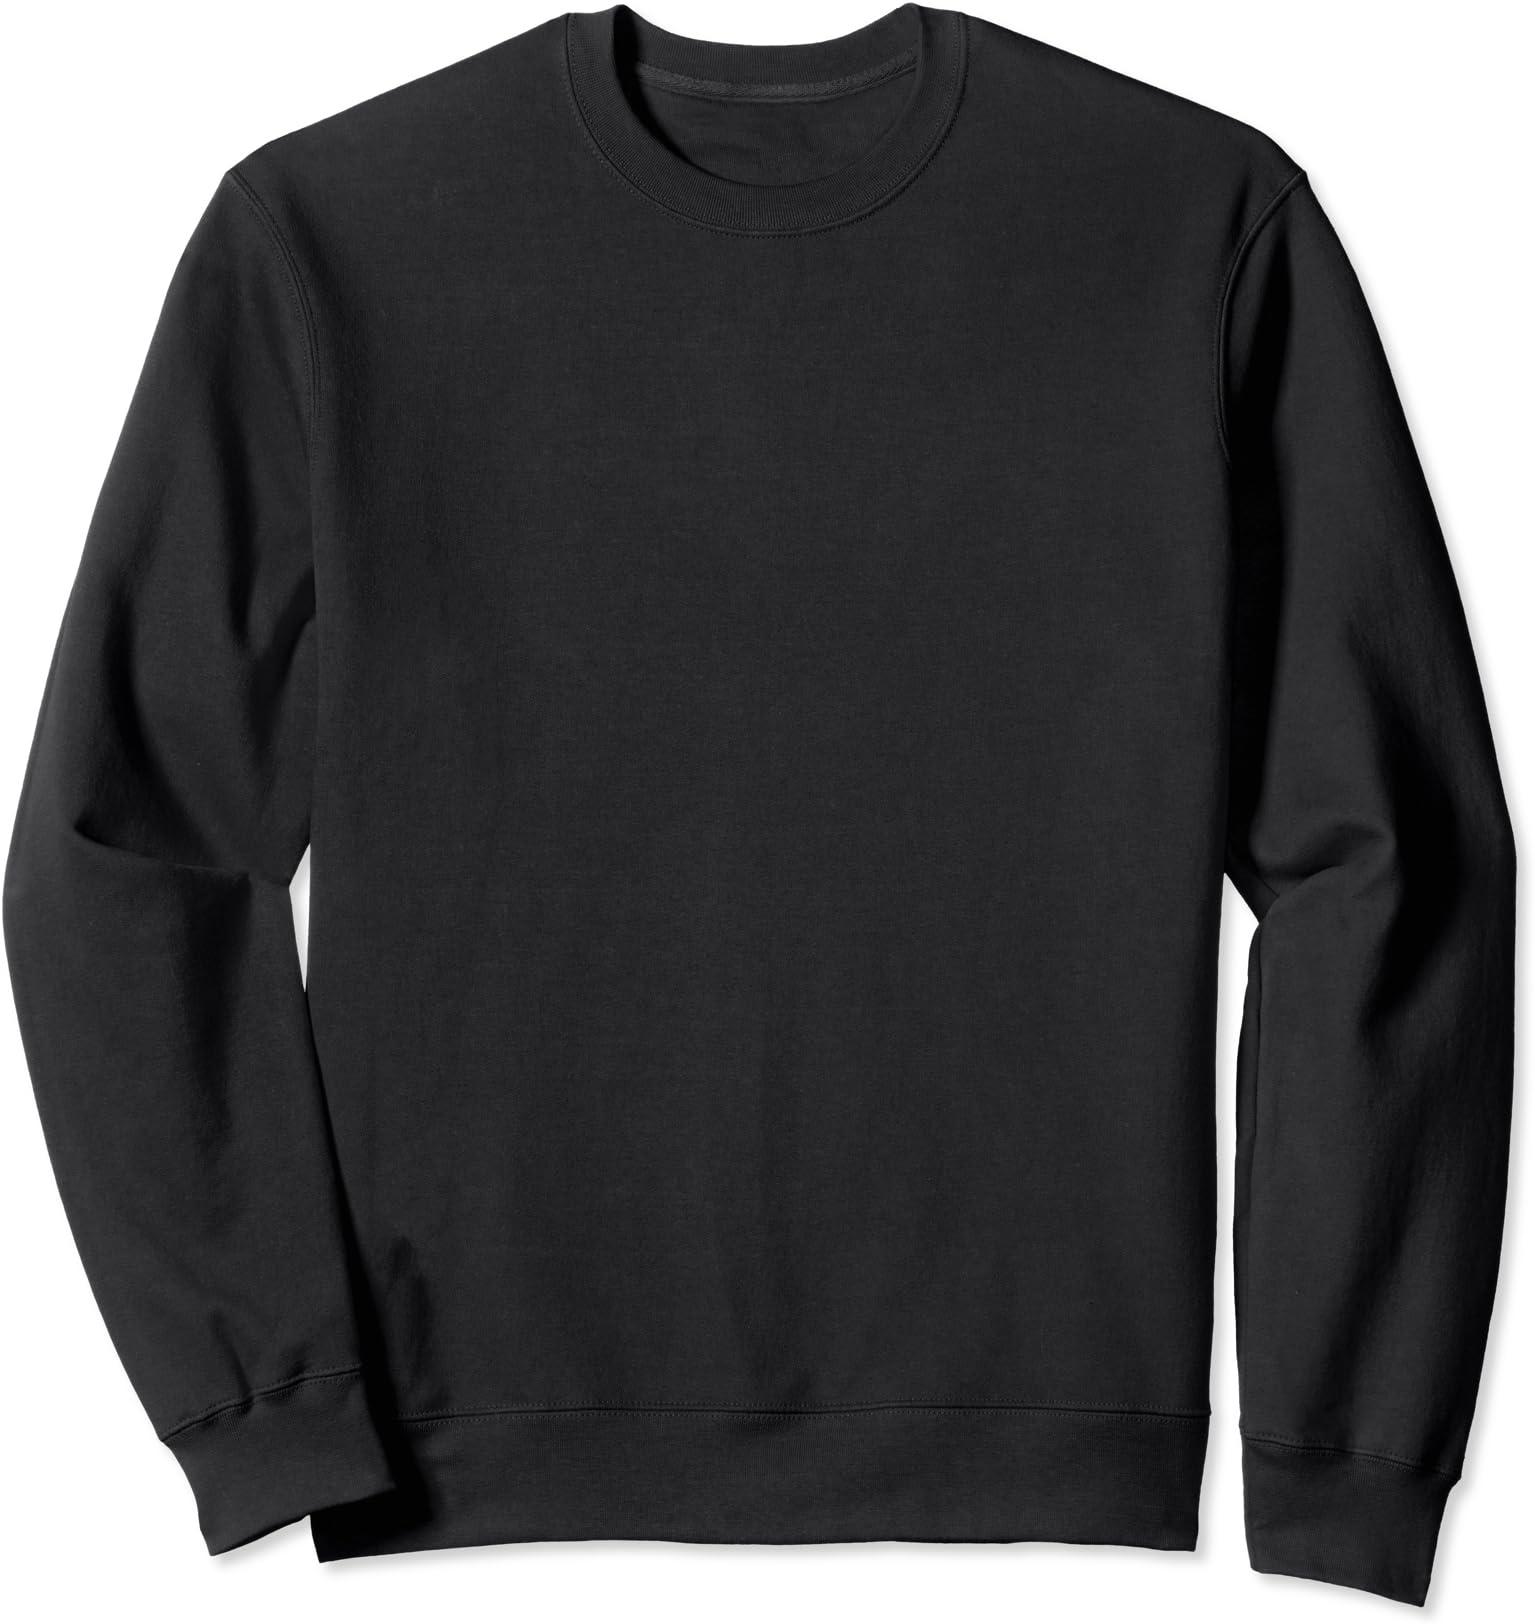 Make Thanksgiving Great Again Donald Trump Turkey Sweatshirt Funny Gift